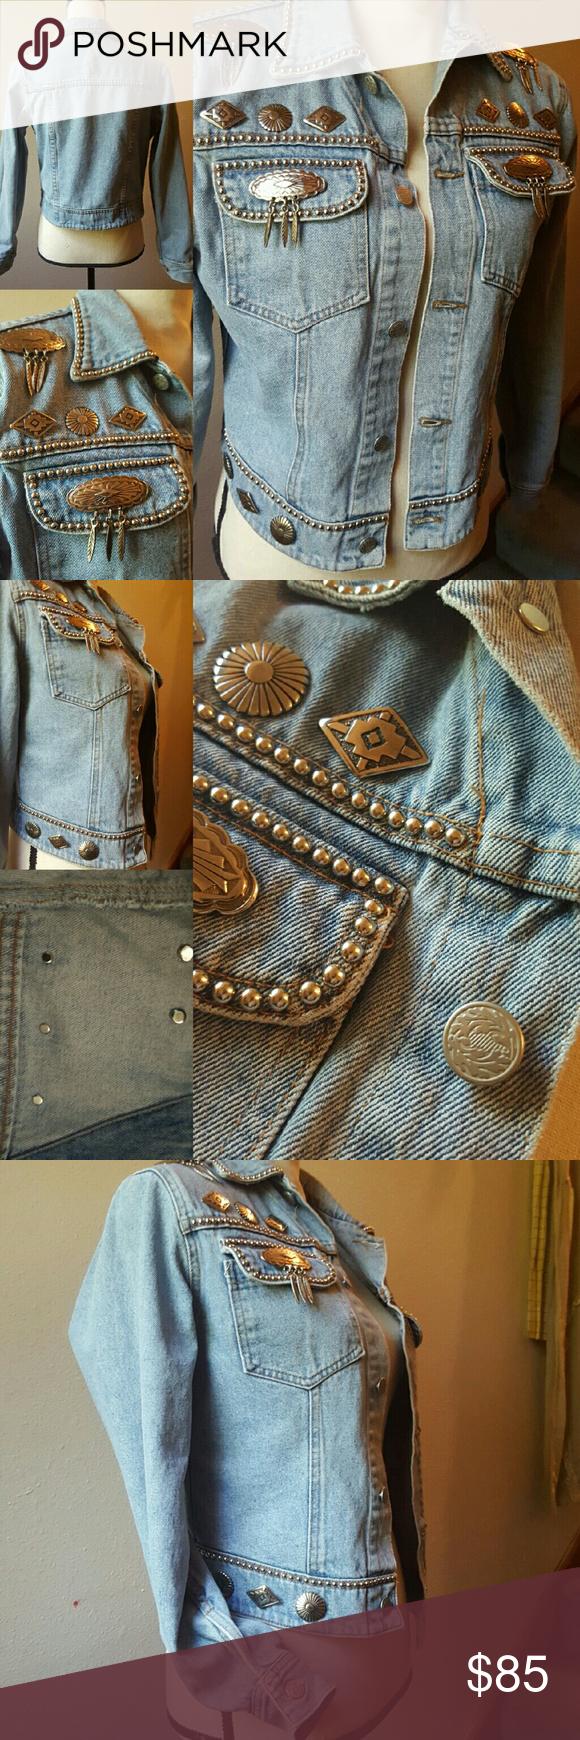 Vintage Western Denim Jacket Silver Conches Embellished Denim Jacket Embellished Clothing Denim [ 1740 x 580 Pixel ]